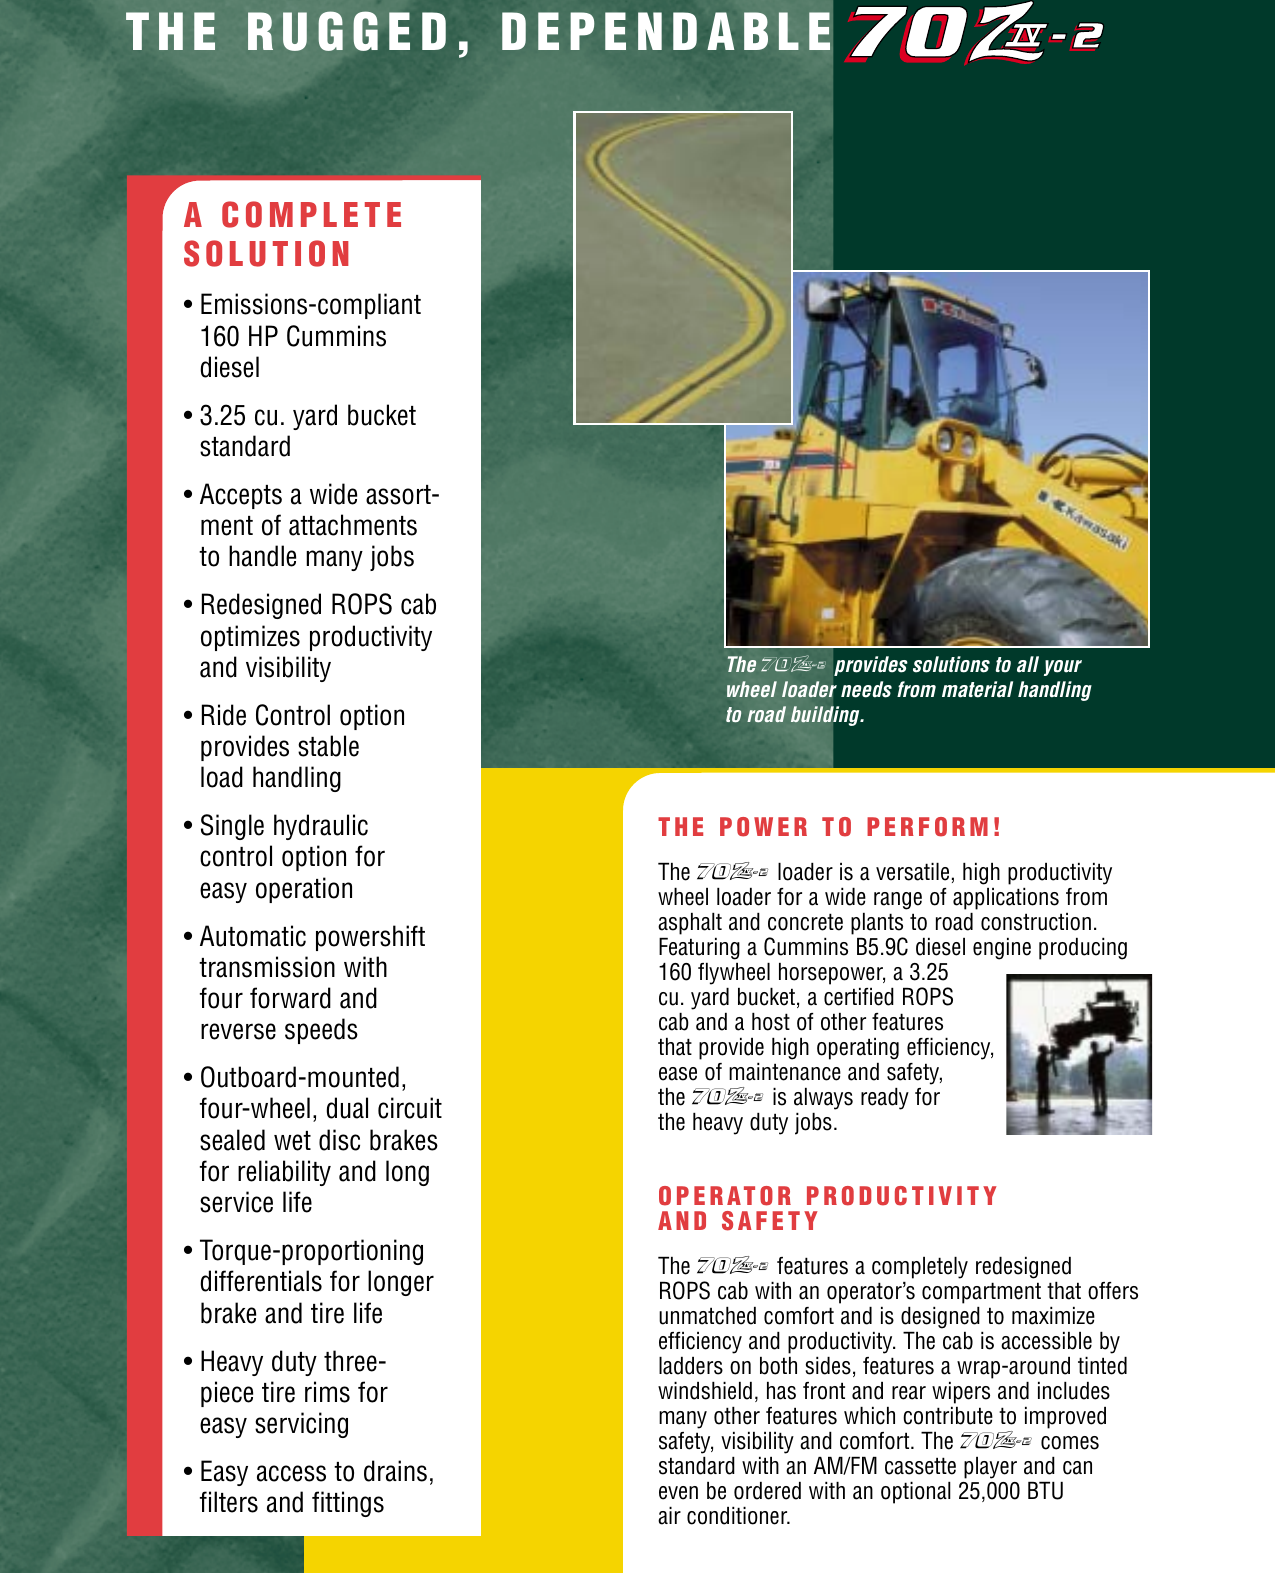 Kawasaki Wheel Loader Manual Fl70 Heater Wiring Diagram Pre Array 70z Iv 2 Users 70ziv2 Brochure Hq Rh Usermanual Wiki